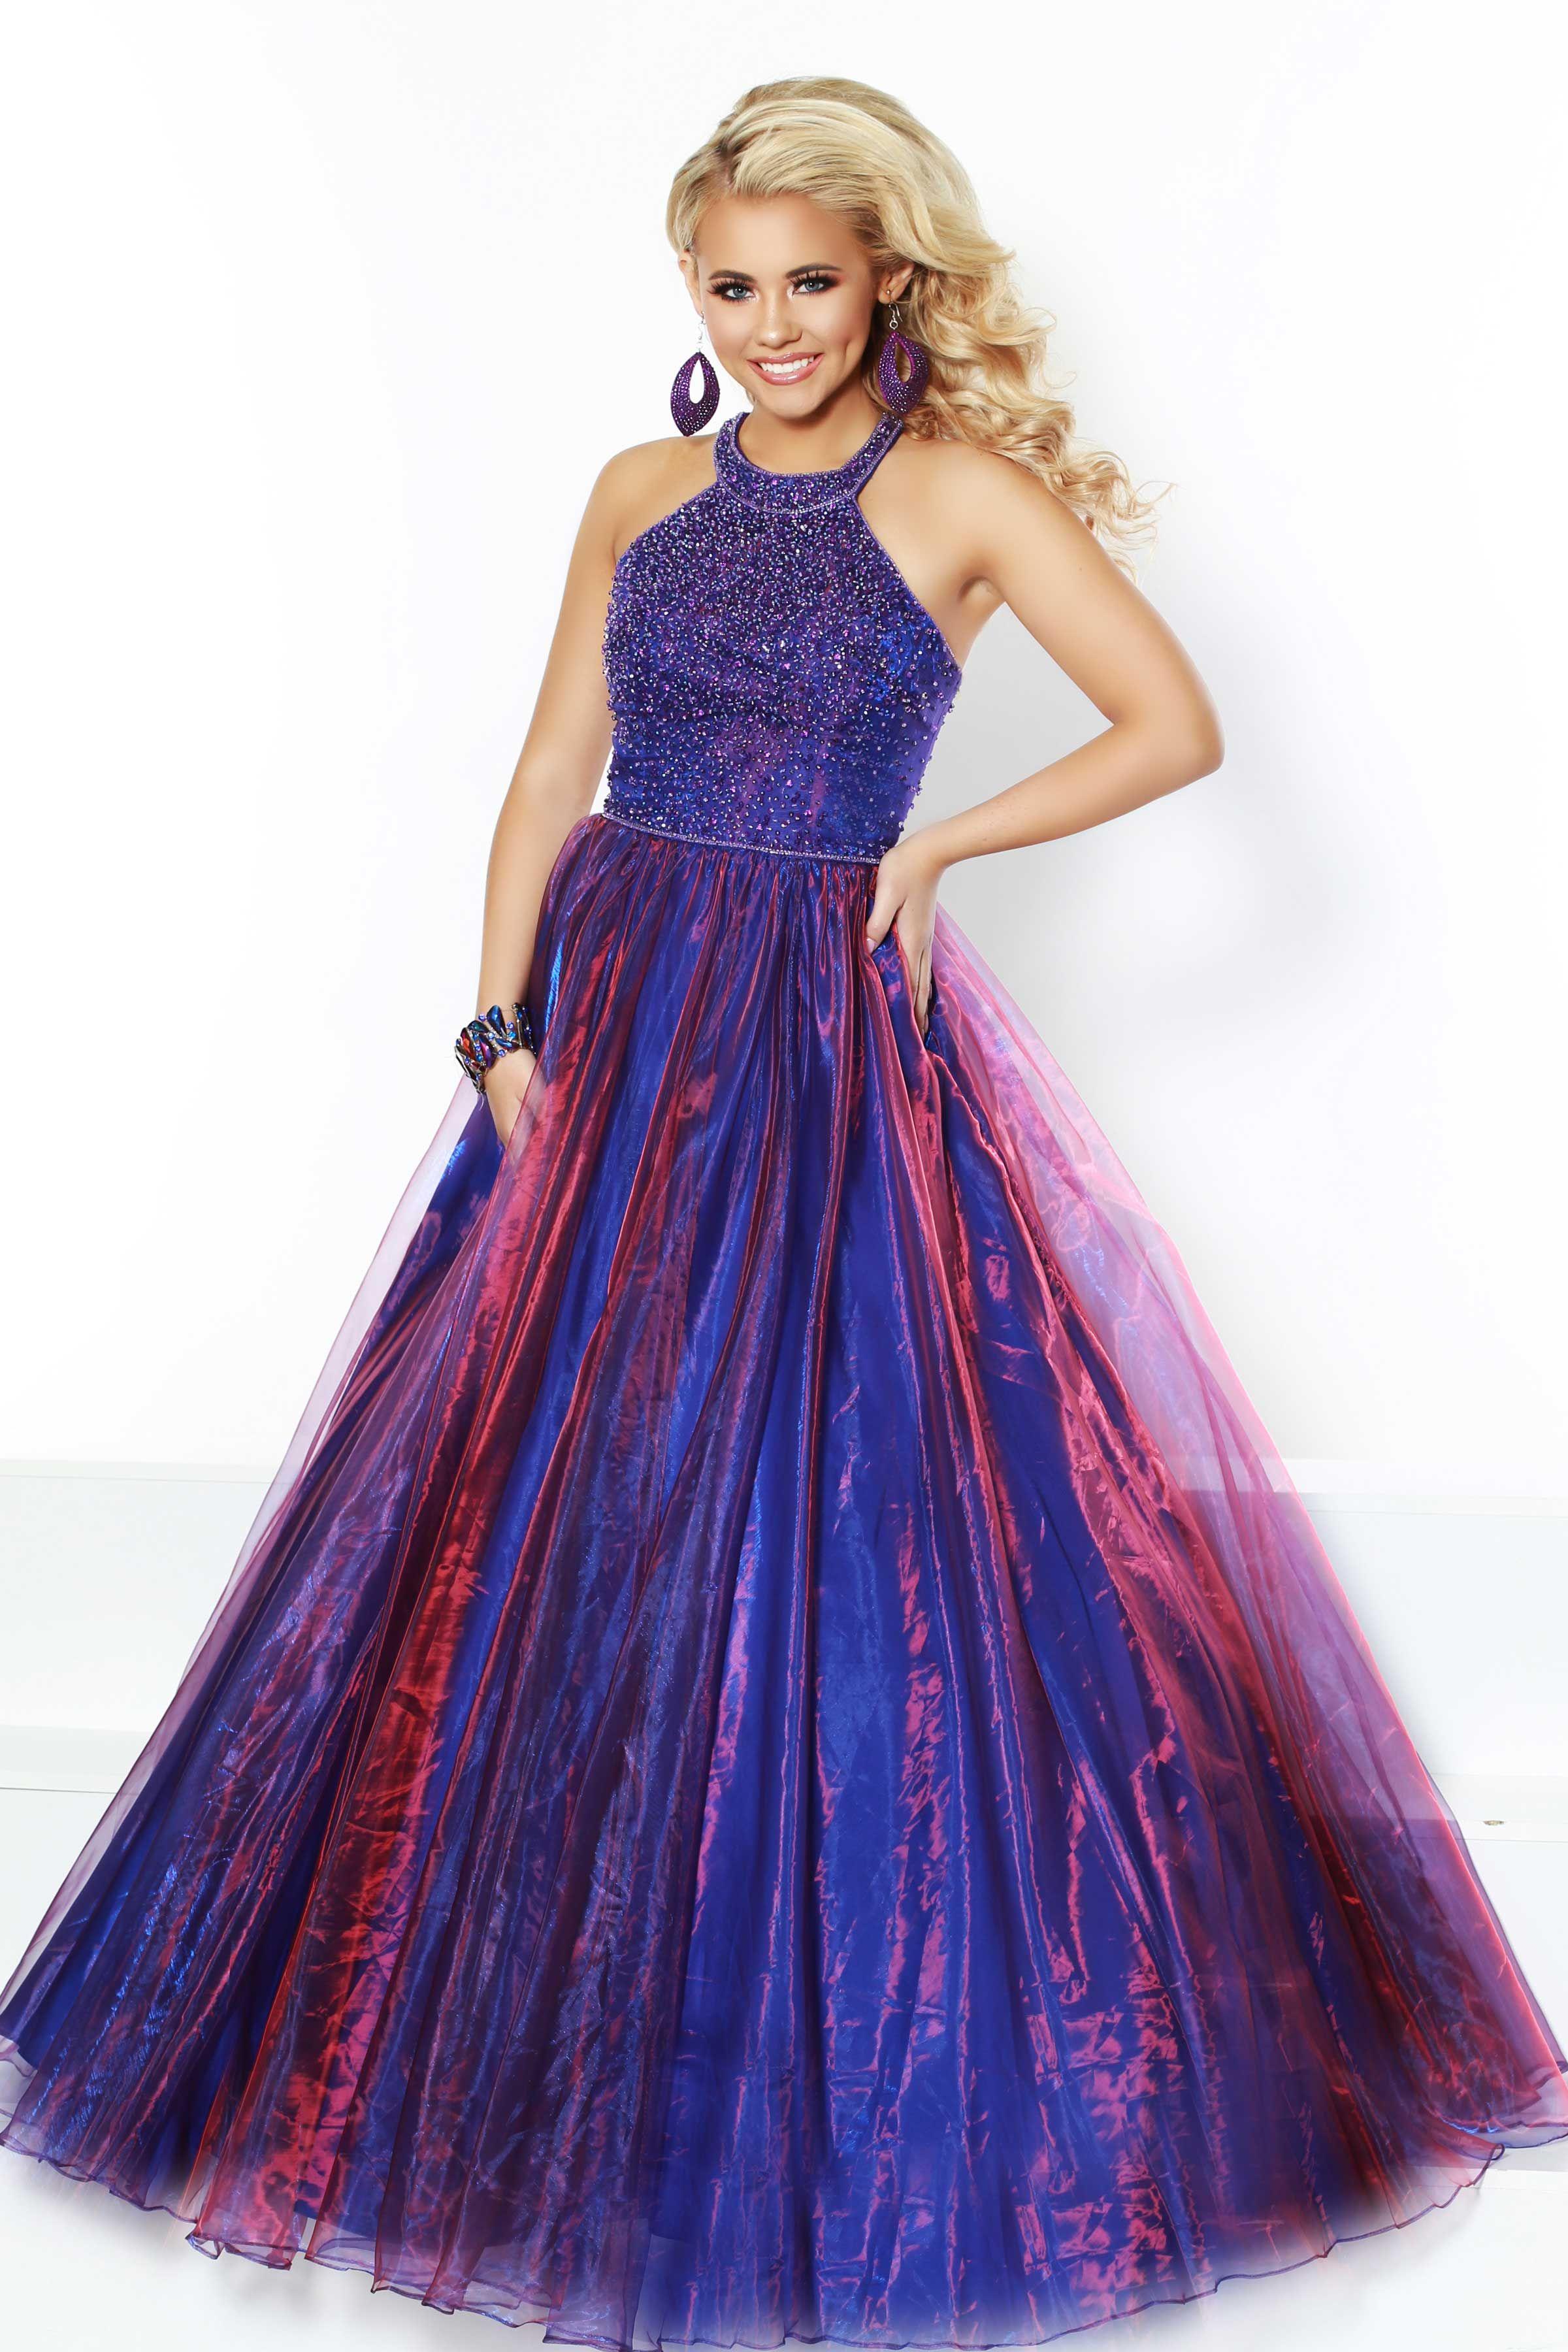 35++ Prom dress omaha information